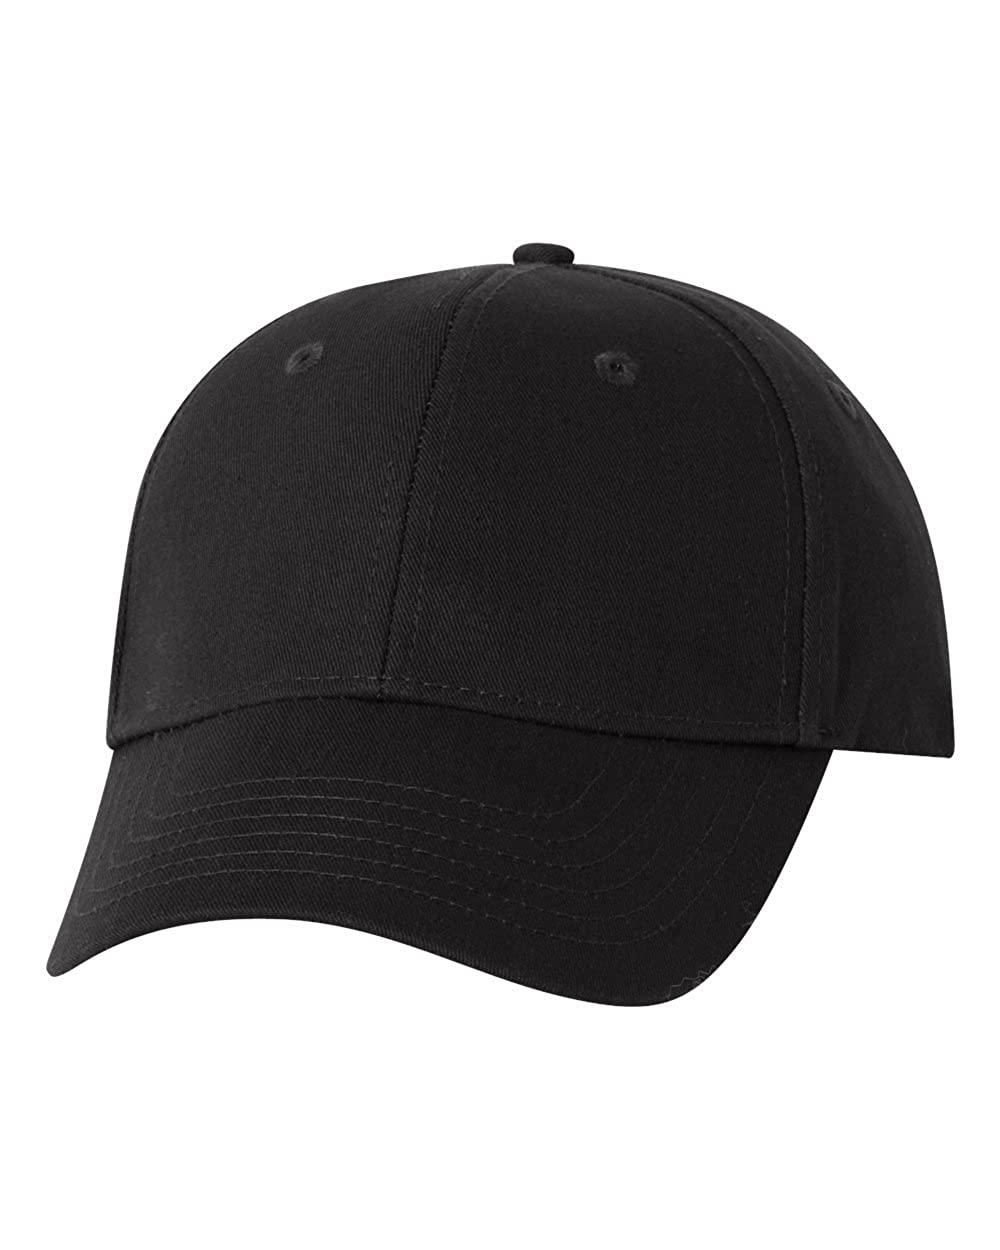 c561ba89 Valucap VC600 - Chino Cap at Amazon Men's Clothing store: